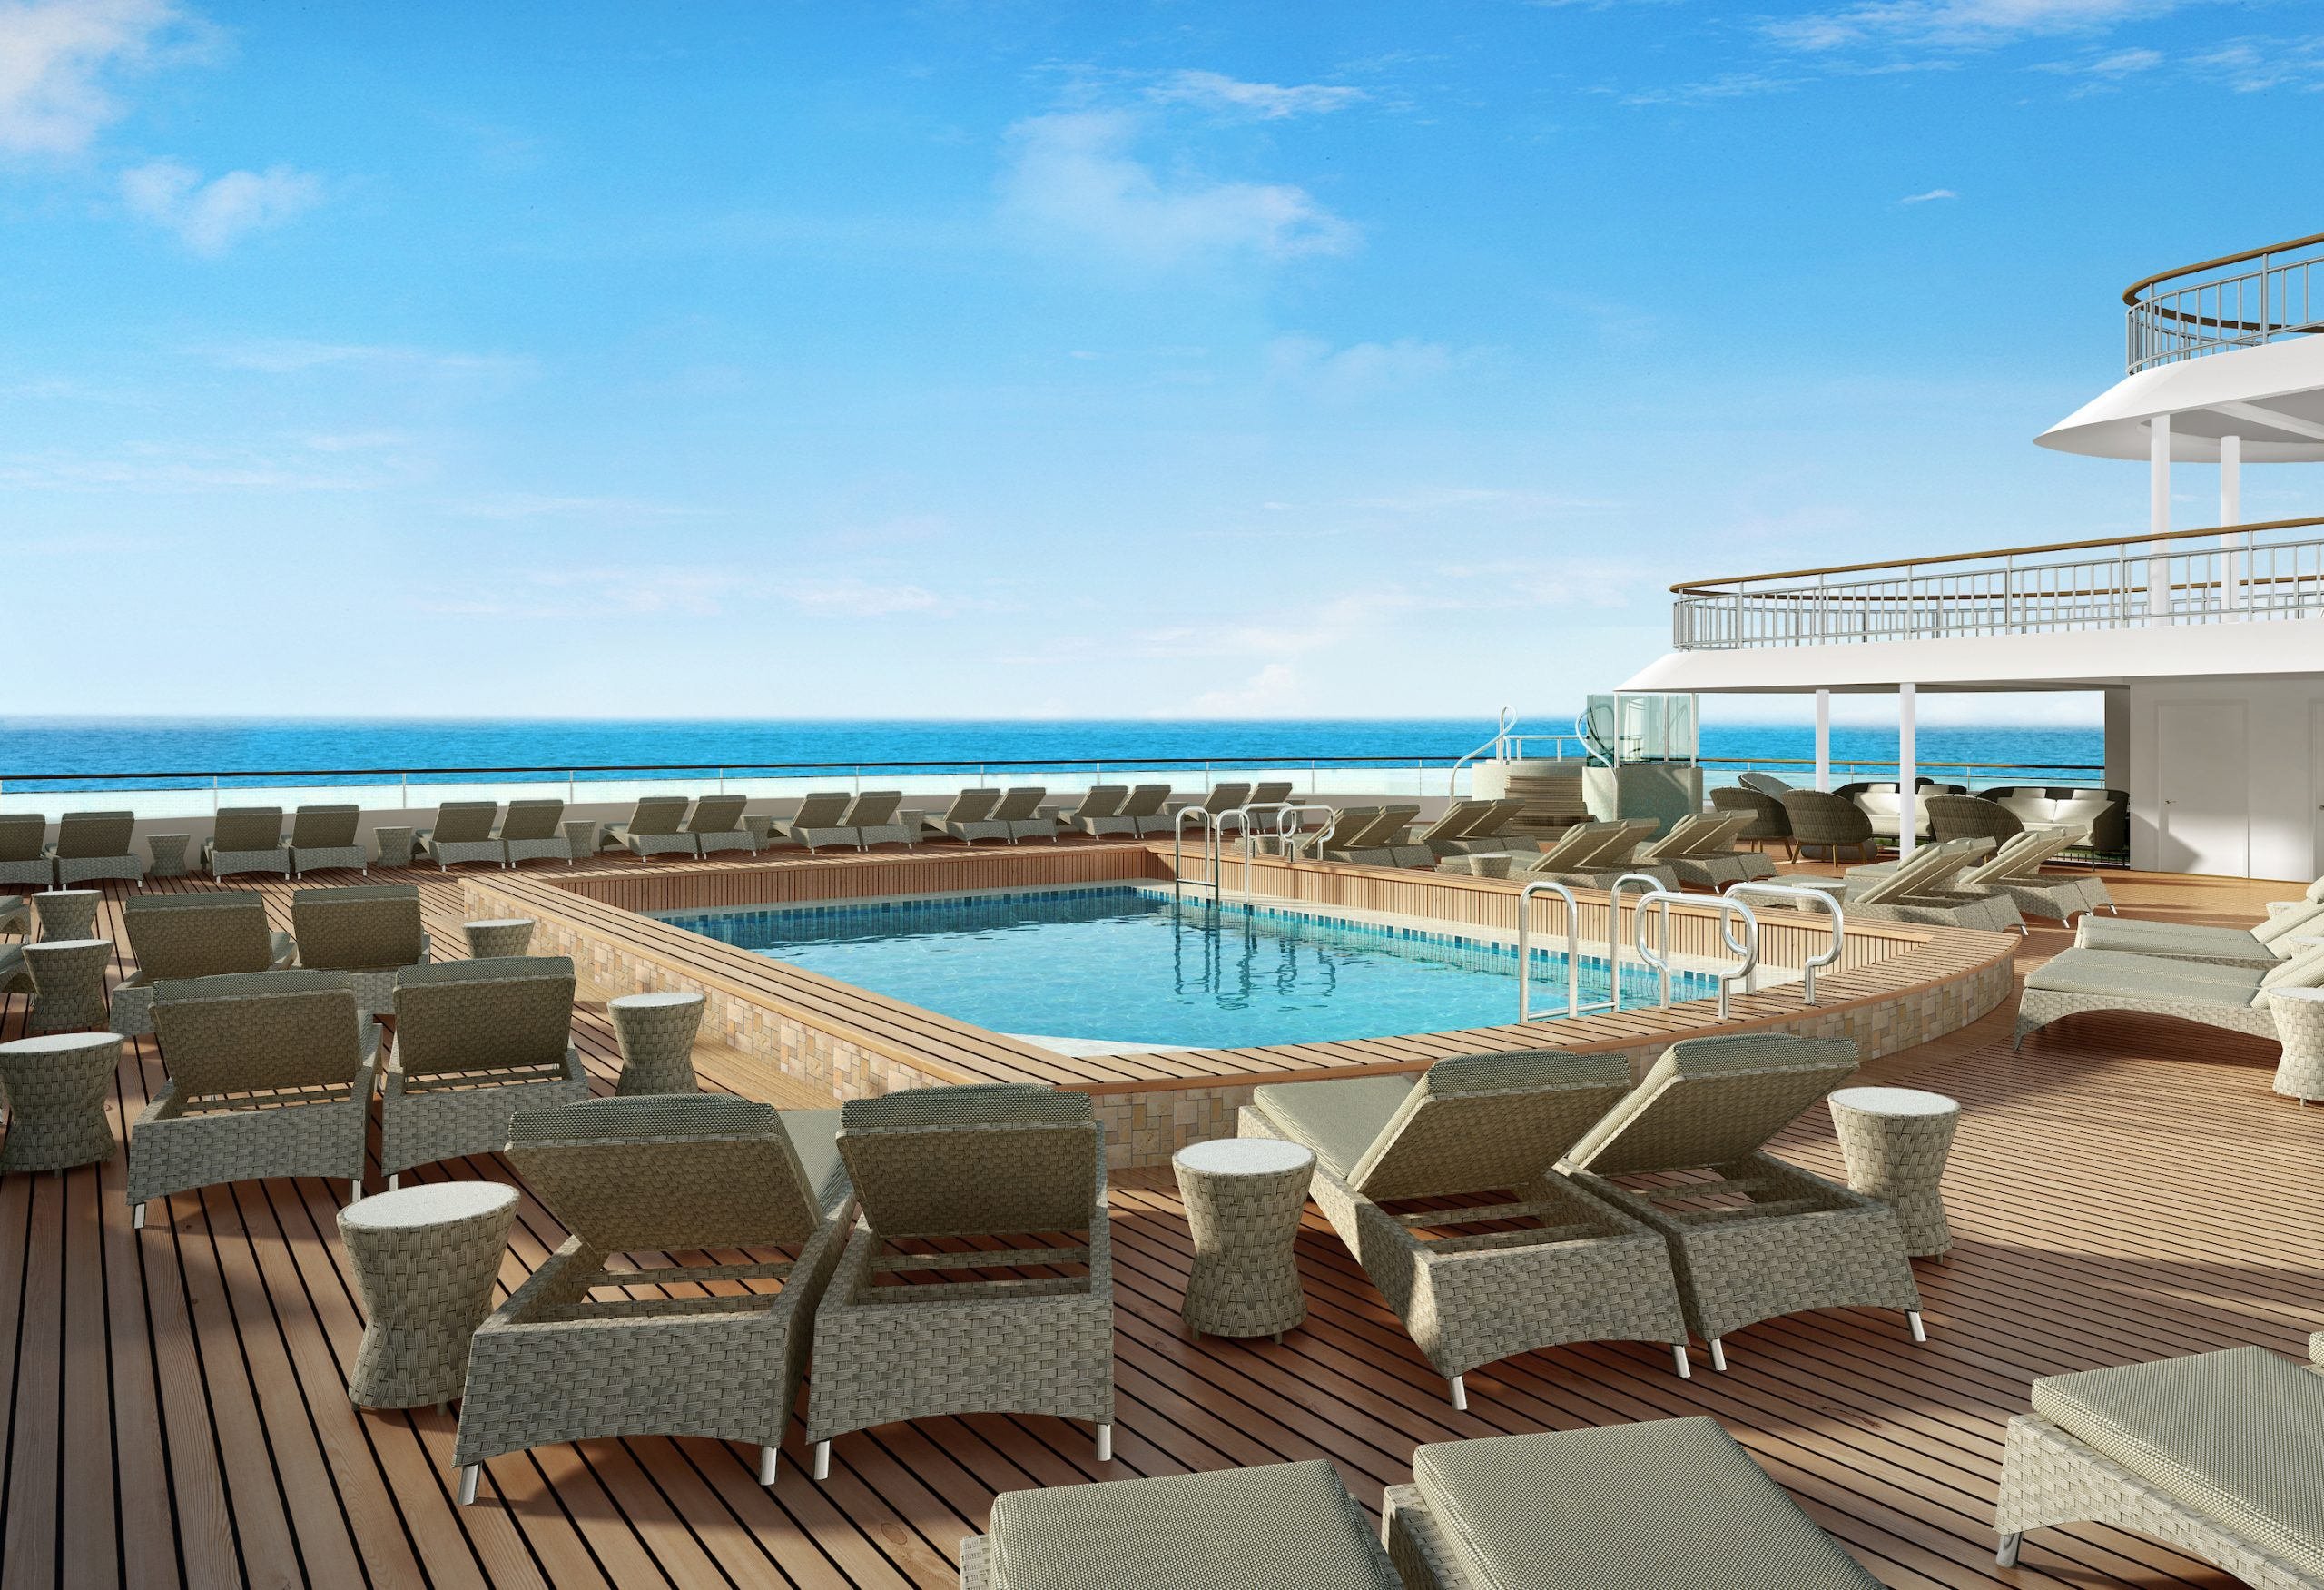 Norwegian cruise line Spirit cruise ship Spice H2O pool